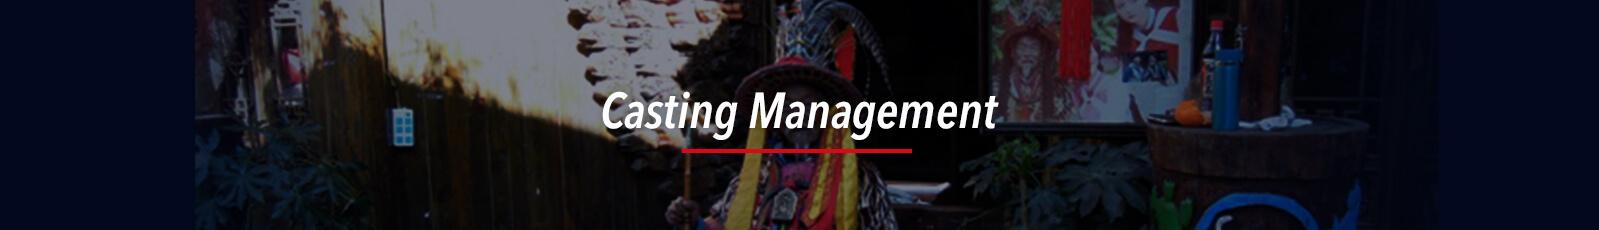 FLY MEDIA Casting Management